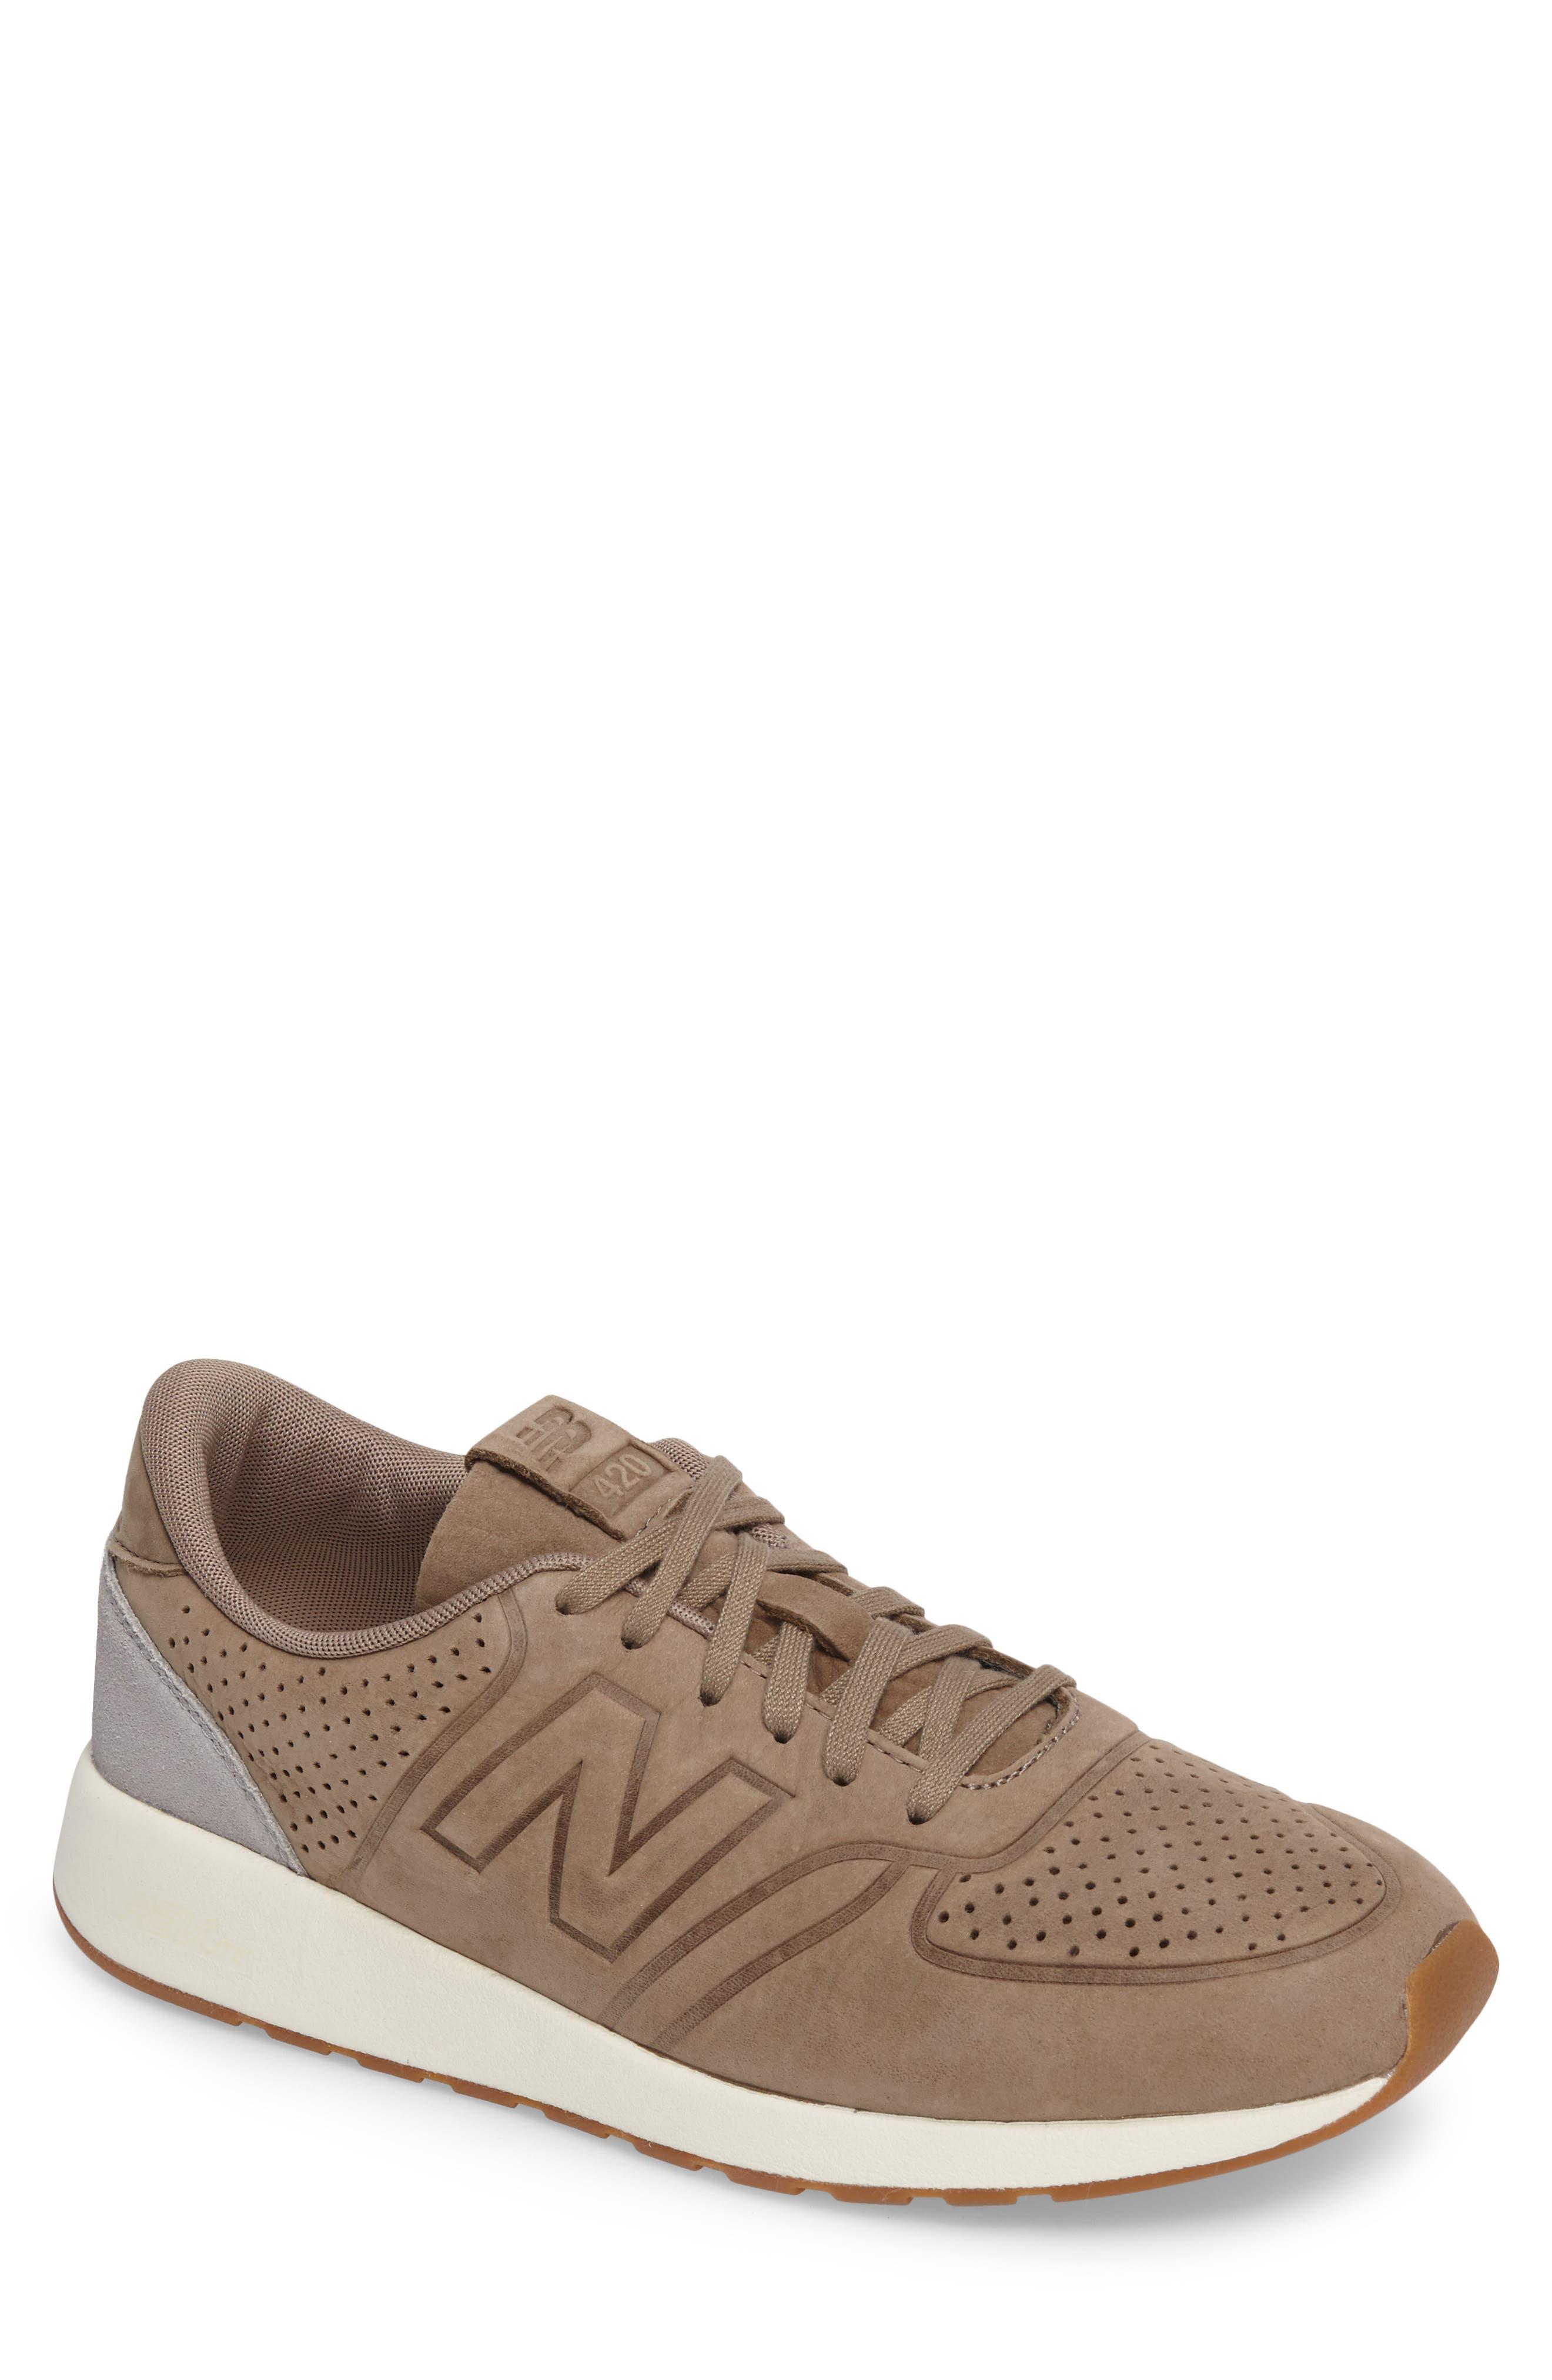 New Balance 420 Premium Decon Sneaker (Men)